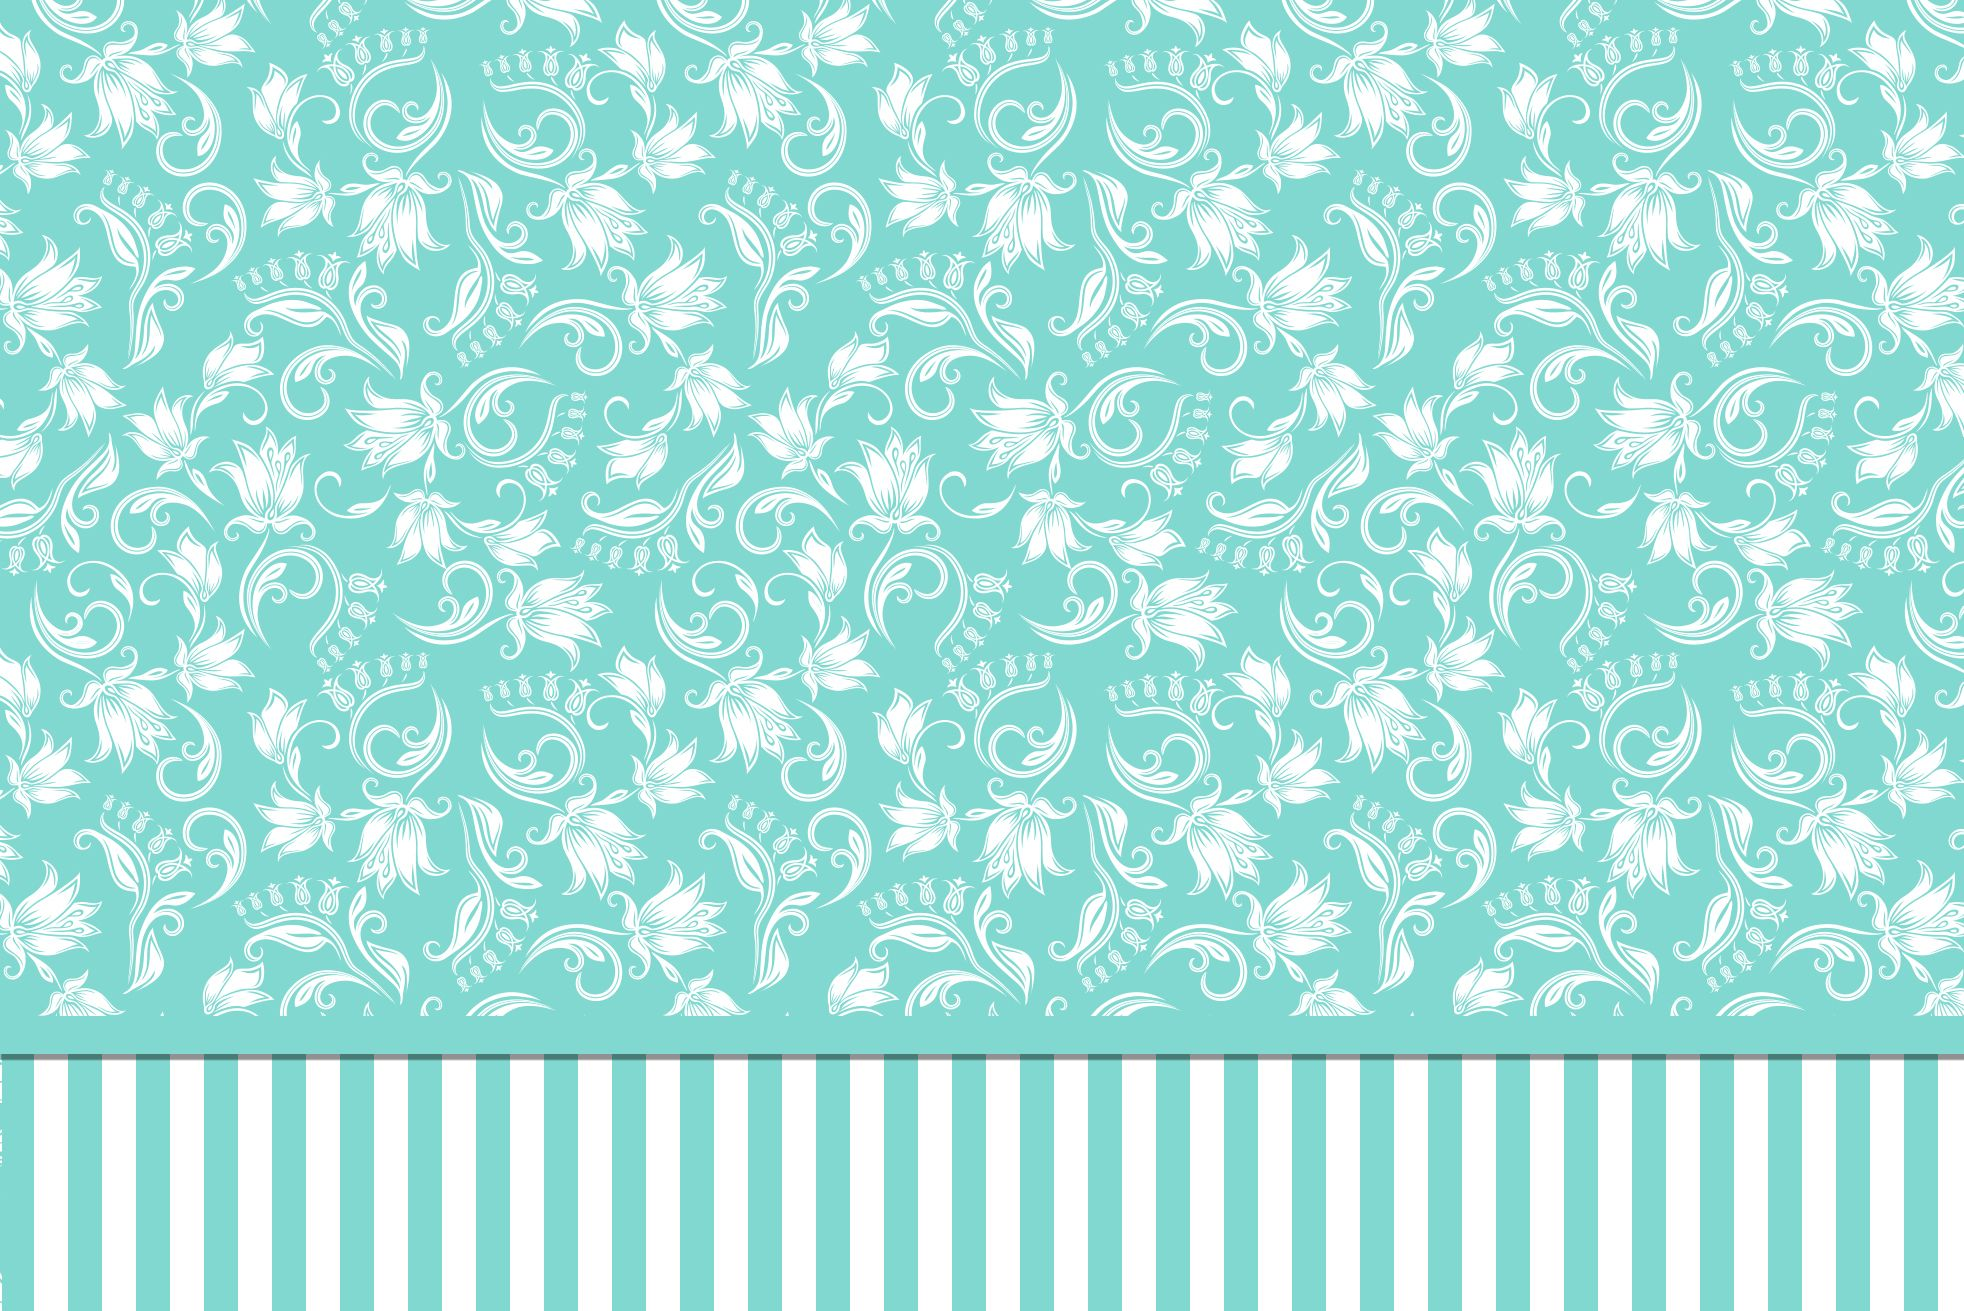 Kit Completo Azul Tiffany Floral e Listras!   moldura   Pinterest ... 2ae937408e